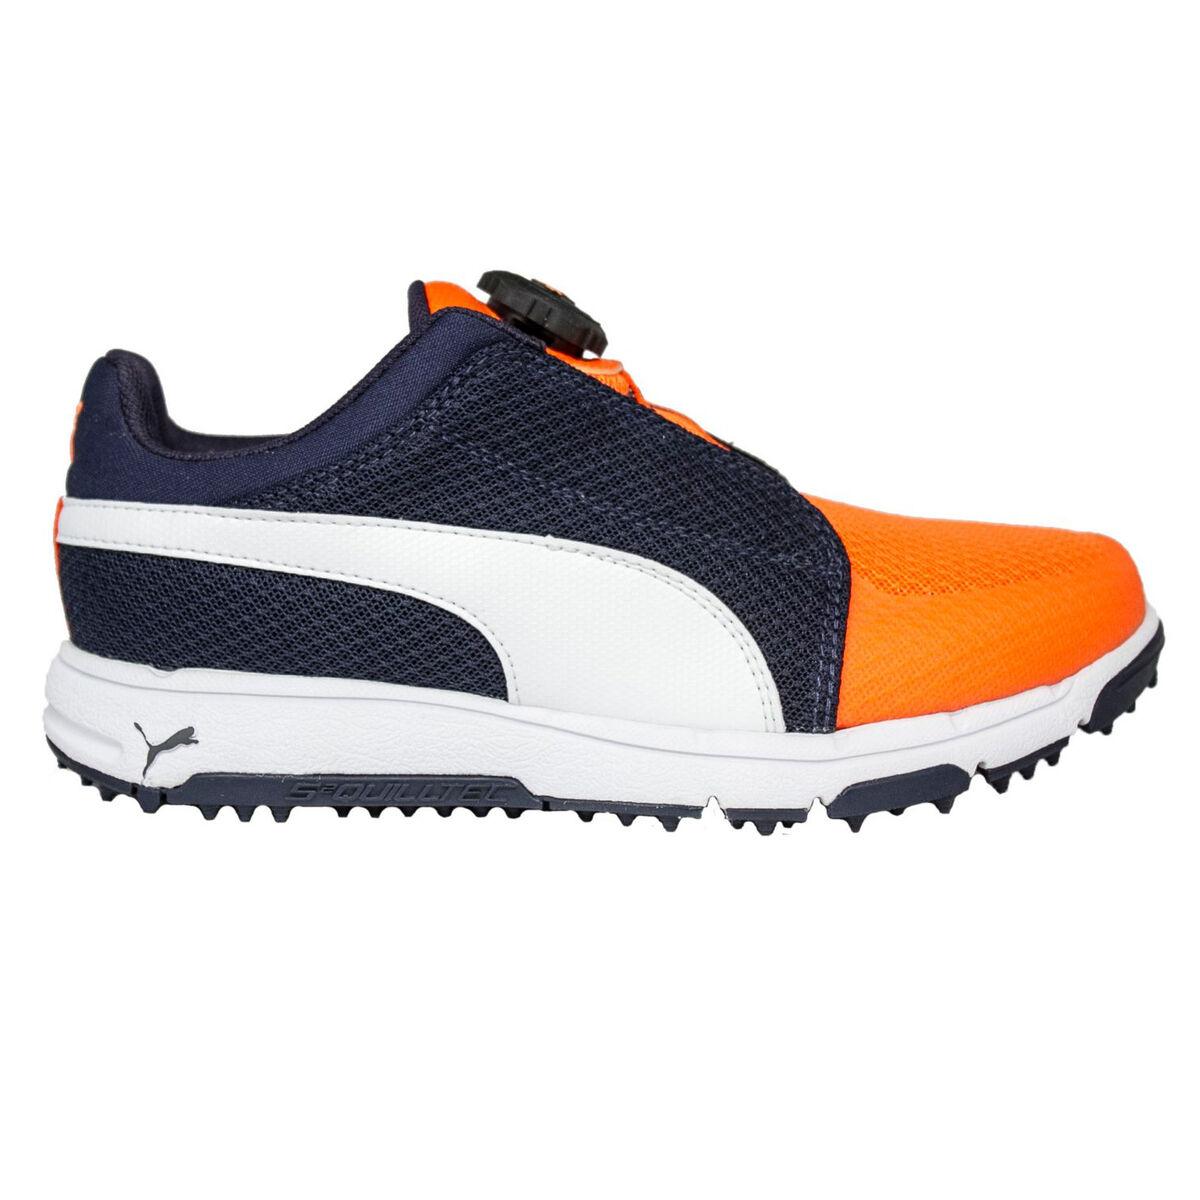 PUMA Grip Sport Disc Junior Golf Shoe - Navy White f55d59ae0